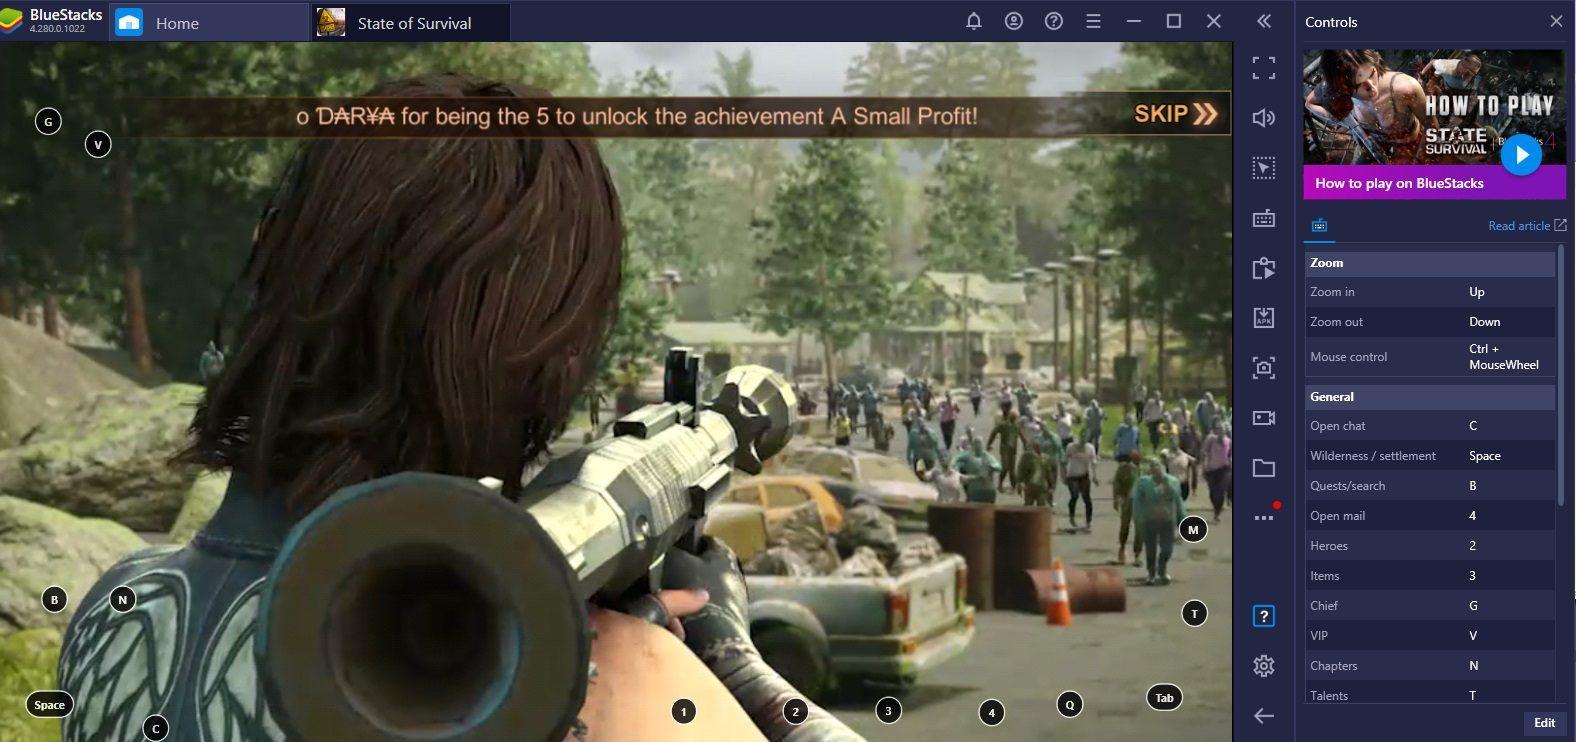 State of Survival x The Walking Dead Kollaboration: Wie du Daryl Dixon findest